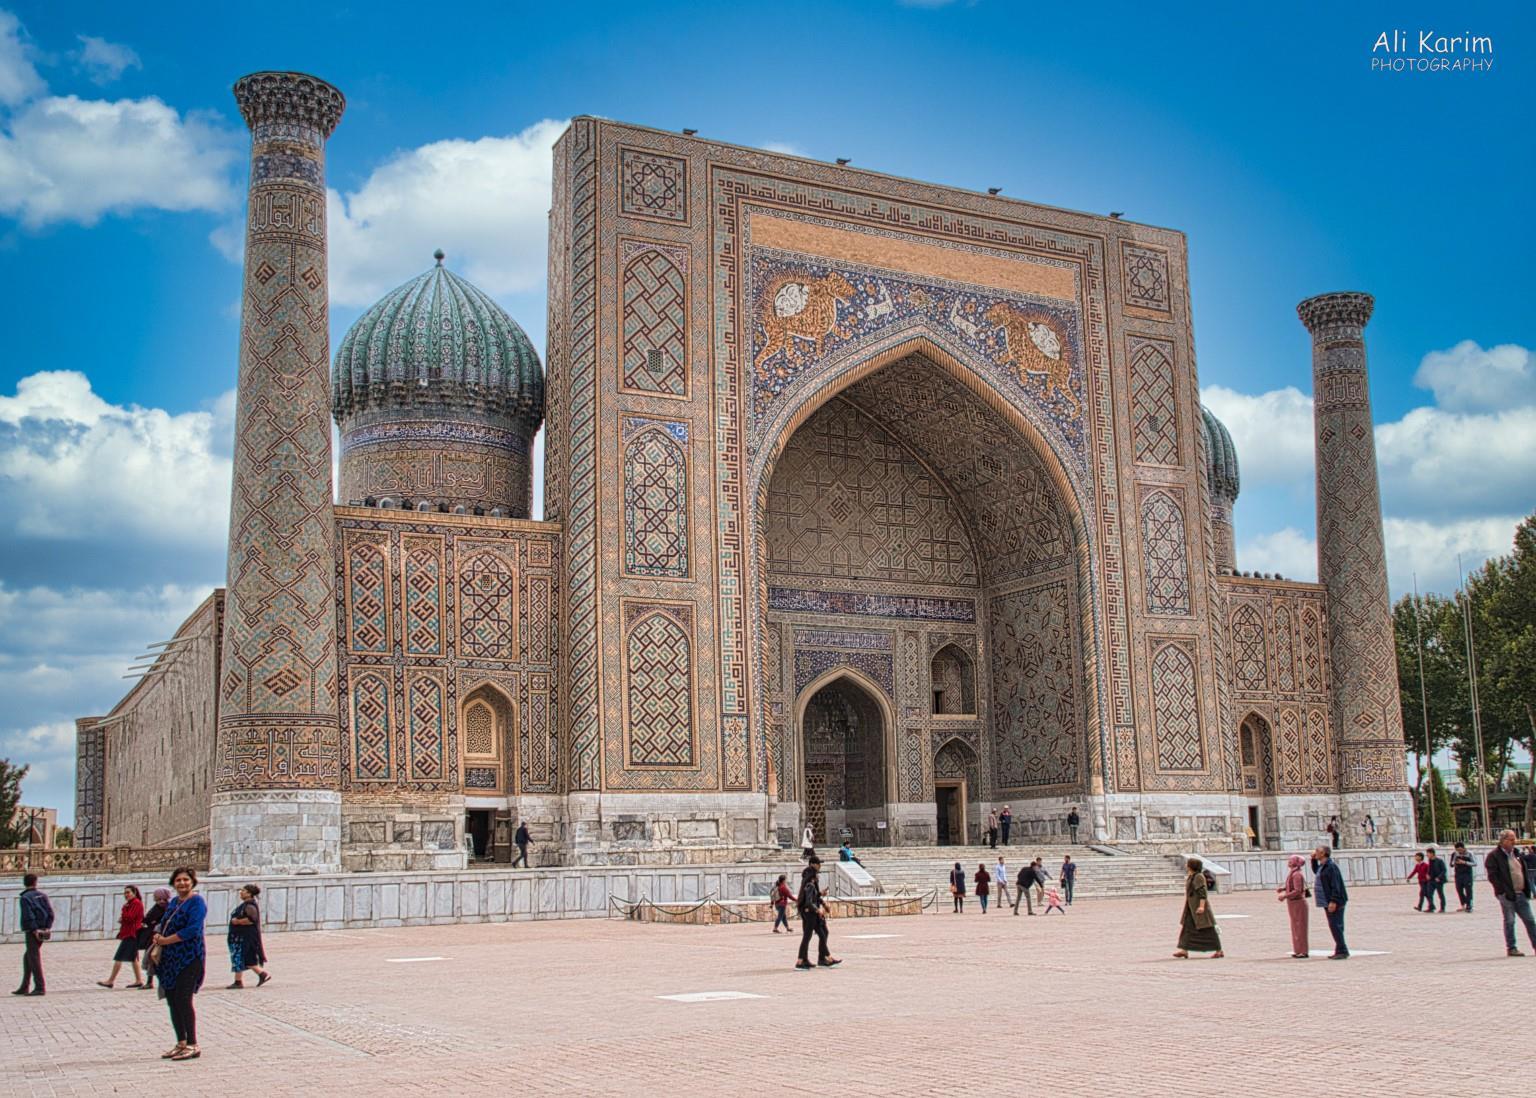 More Samarkand, The 3rd Madrassah, Sher-Dor Madrasah